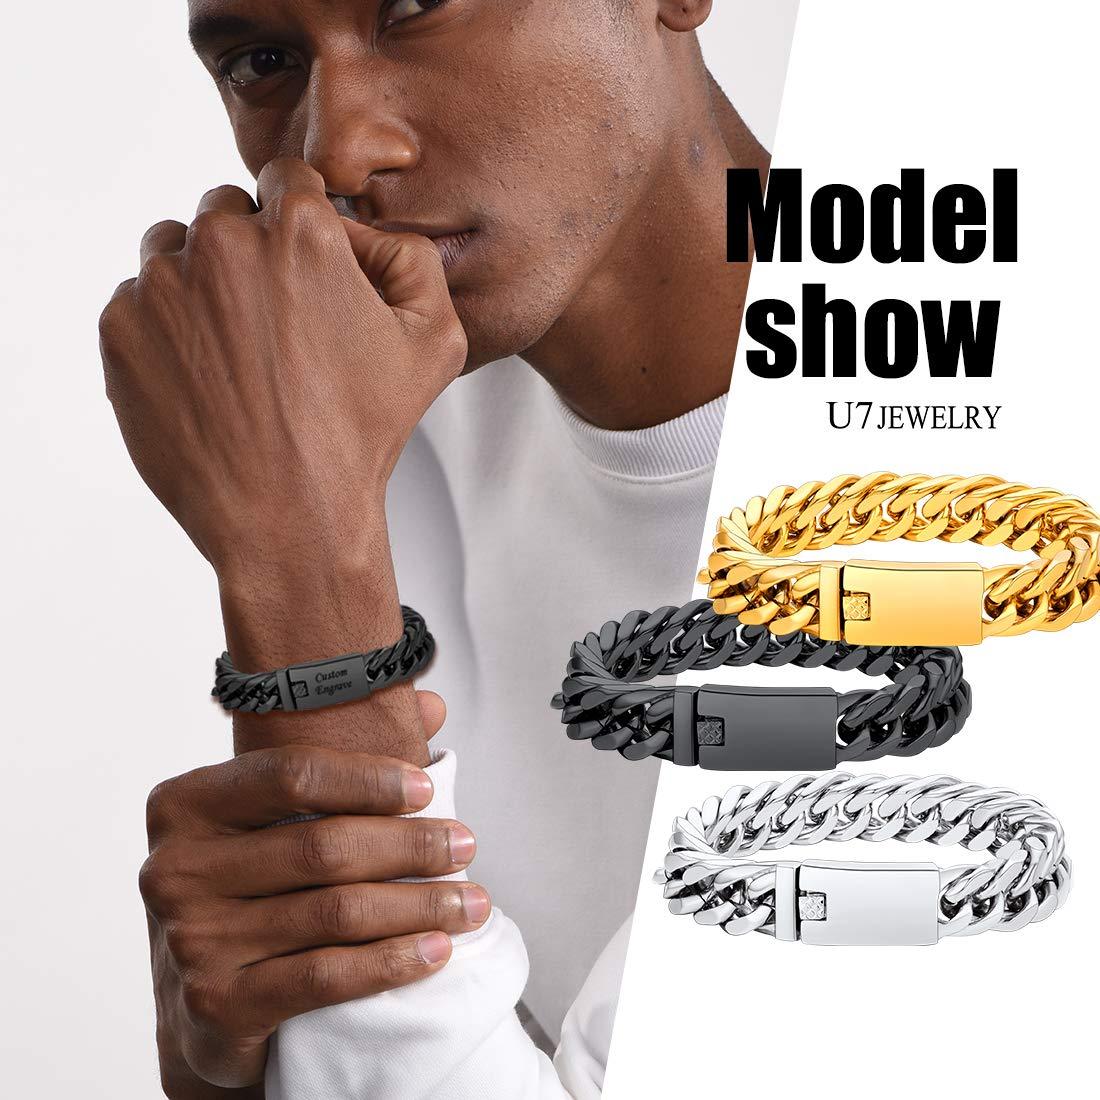 Length 19CM to 21CM U7 Custom ID Bracelet Men Women Stainless Steel 7MM Wide Cuban Curb Link Chain Personalized Message Engrave Bar Bracelet Bangle